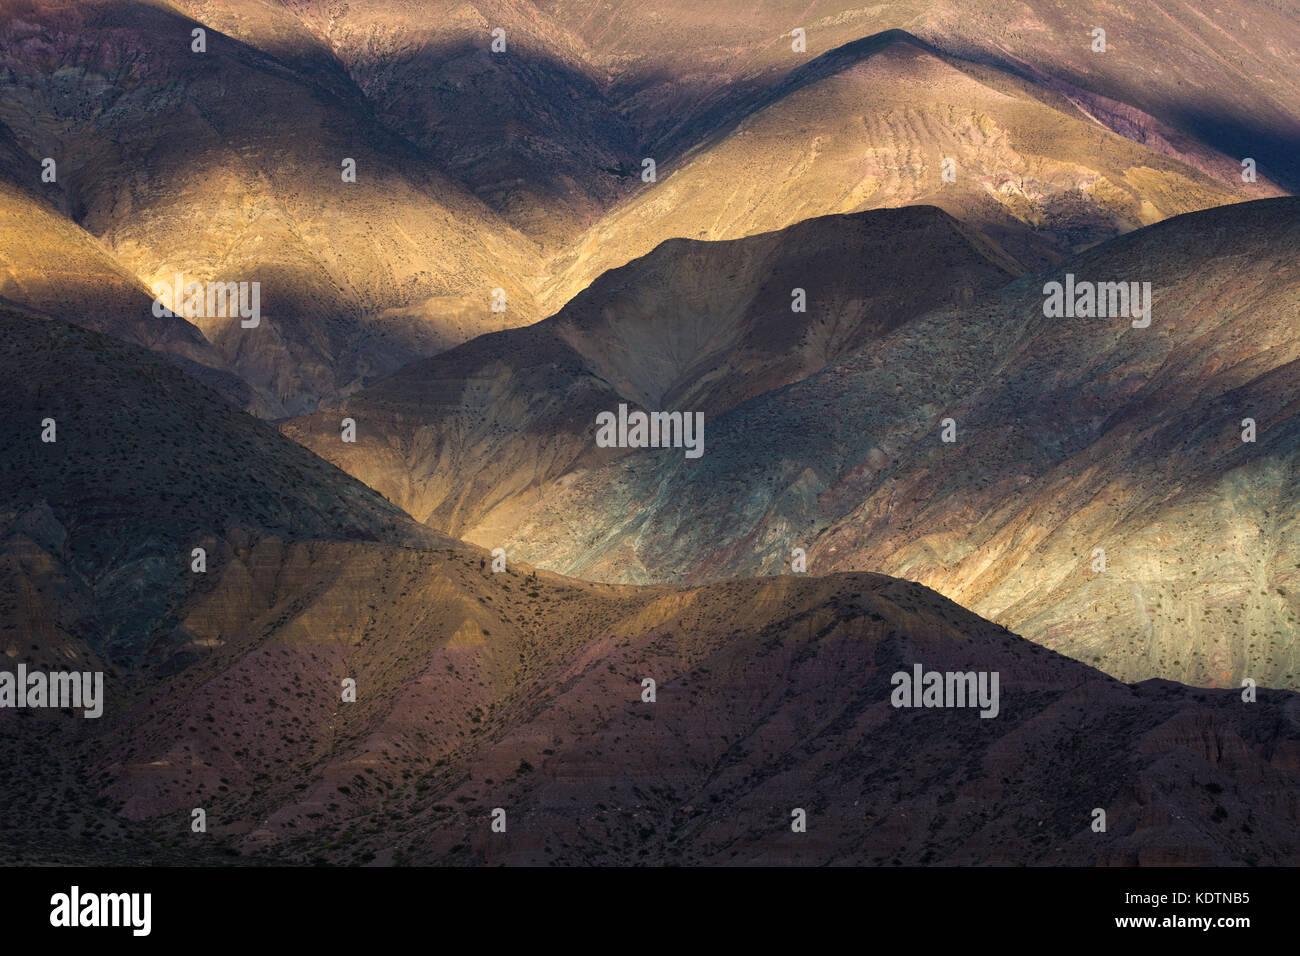 First light on the hills near Purmamarca, Quebrada de Humahuacha, Jujuy Province, Argentina - Stock Image